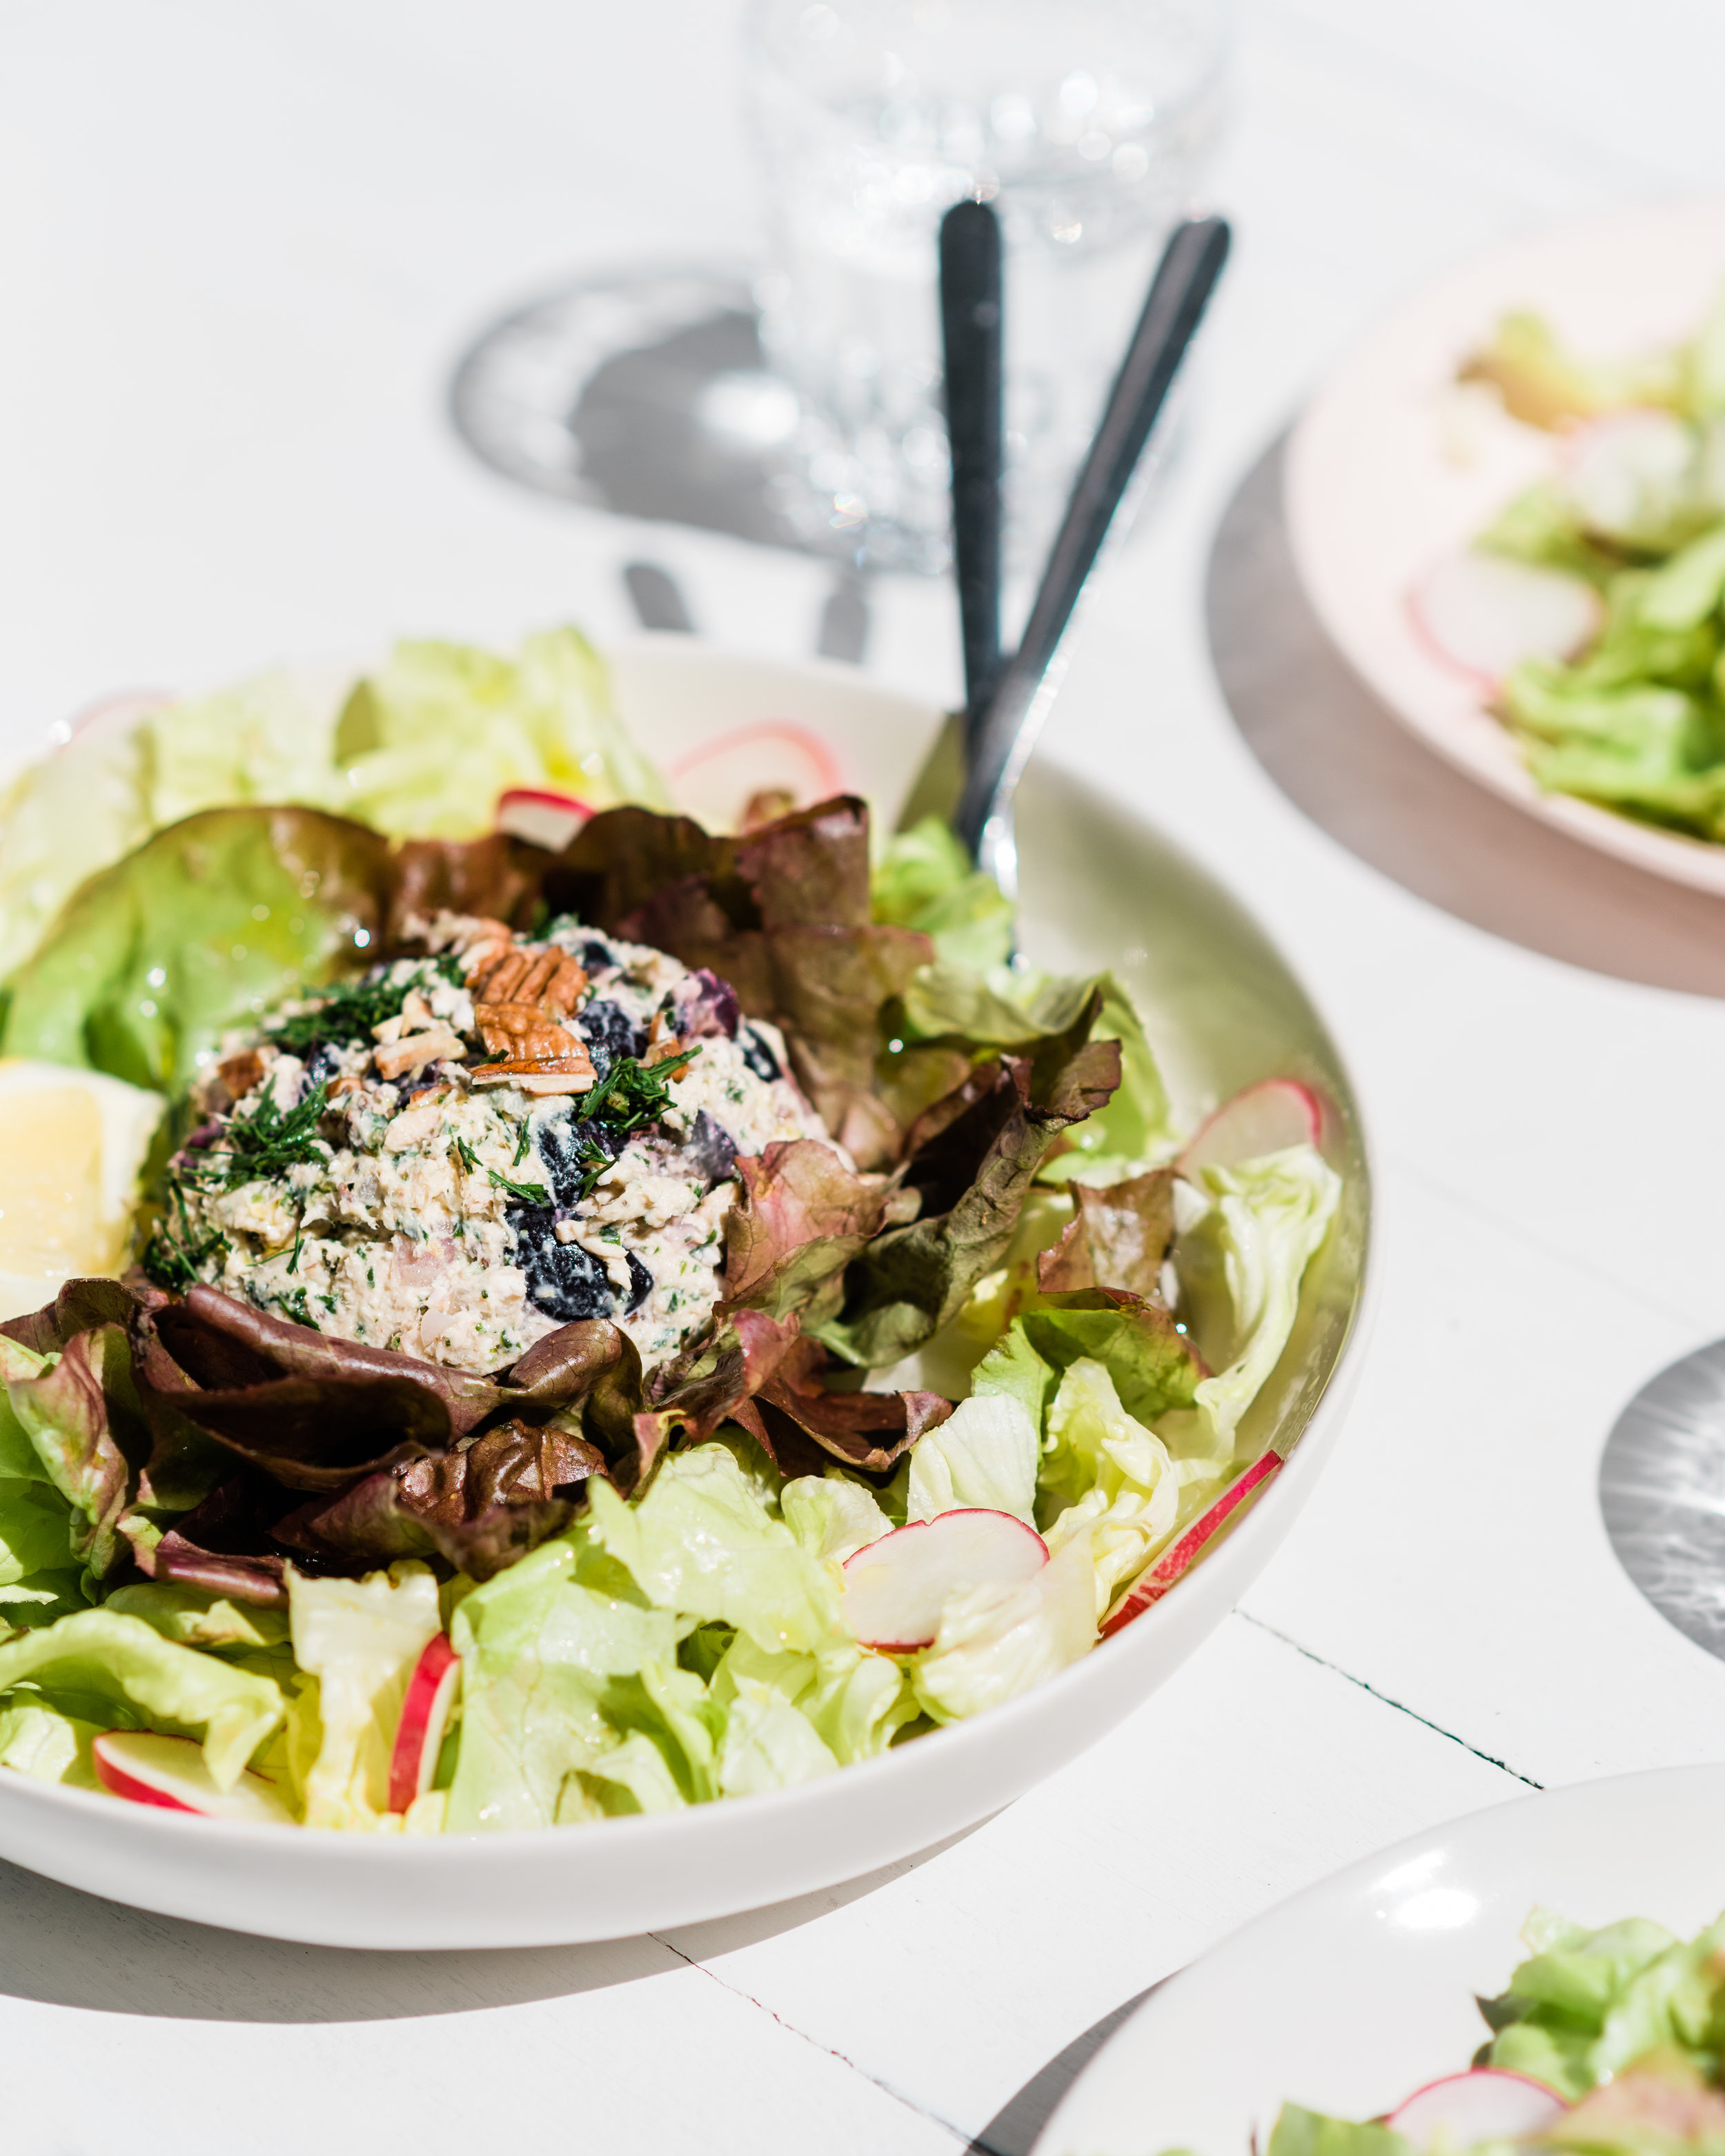 GRK Tuna Salad on a bed of Butter Lettuce and shredded Little Gem.